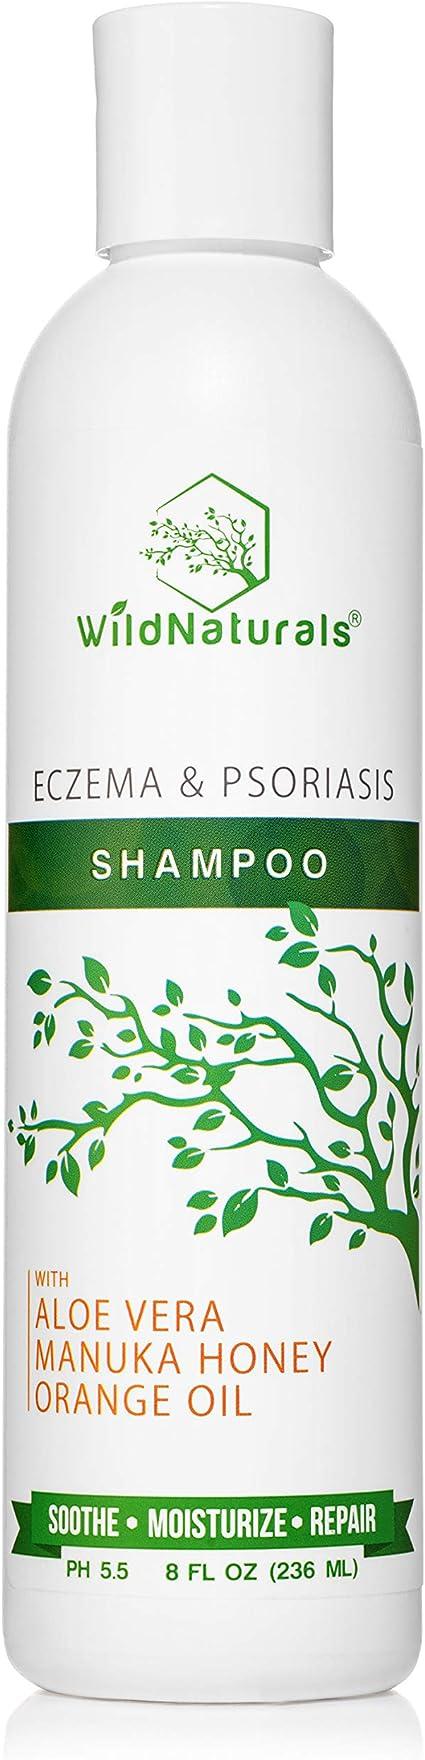 natural shampoo for psoriasis australia